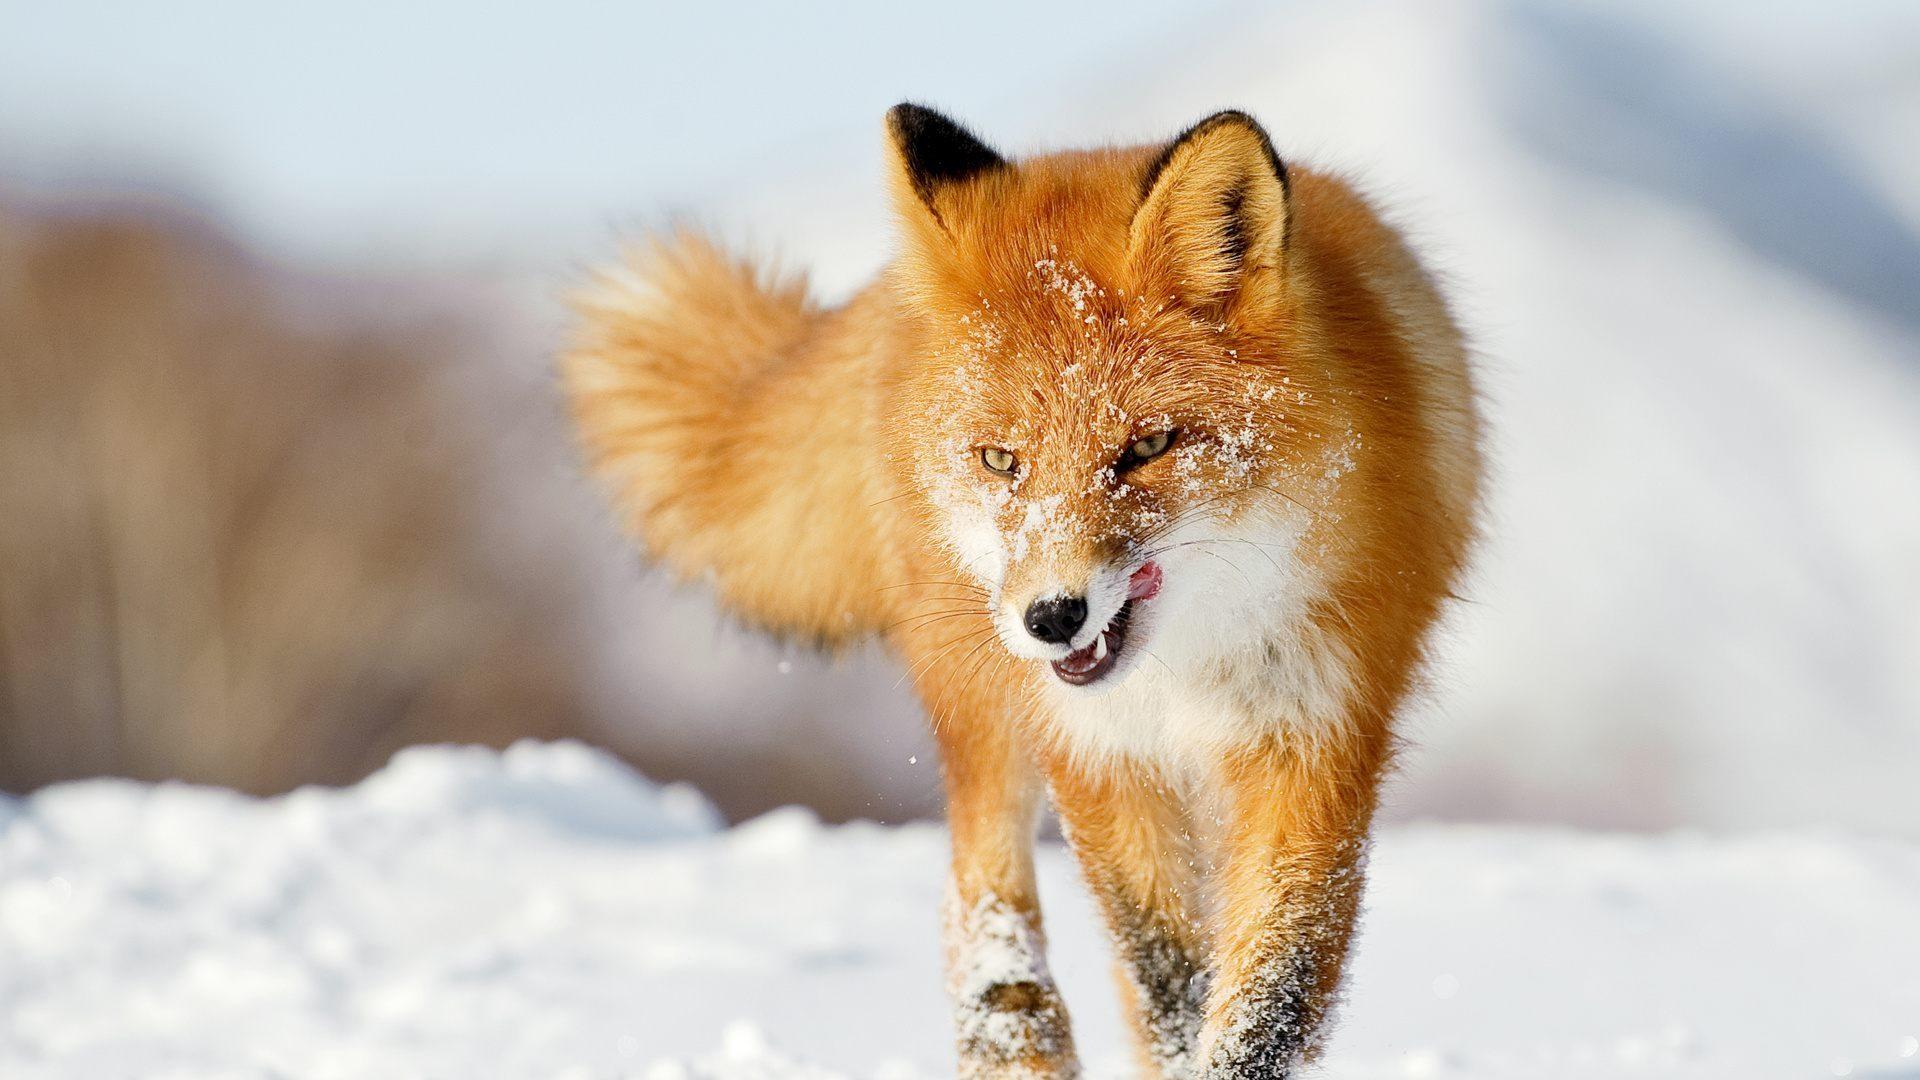 10 Top Cute Wild Animal Wallpaper Full Hd 1080p For Pc: 1920x1080 :: Fondos De Pantalla Y